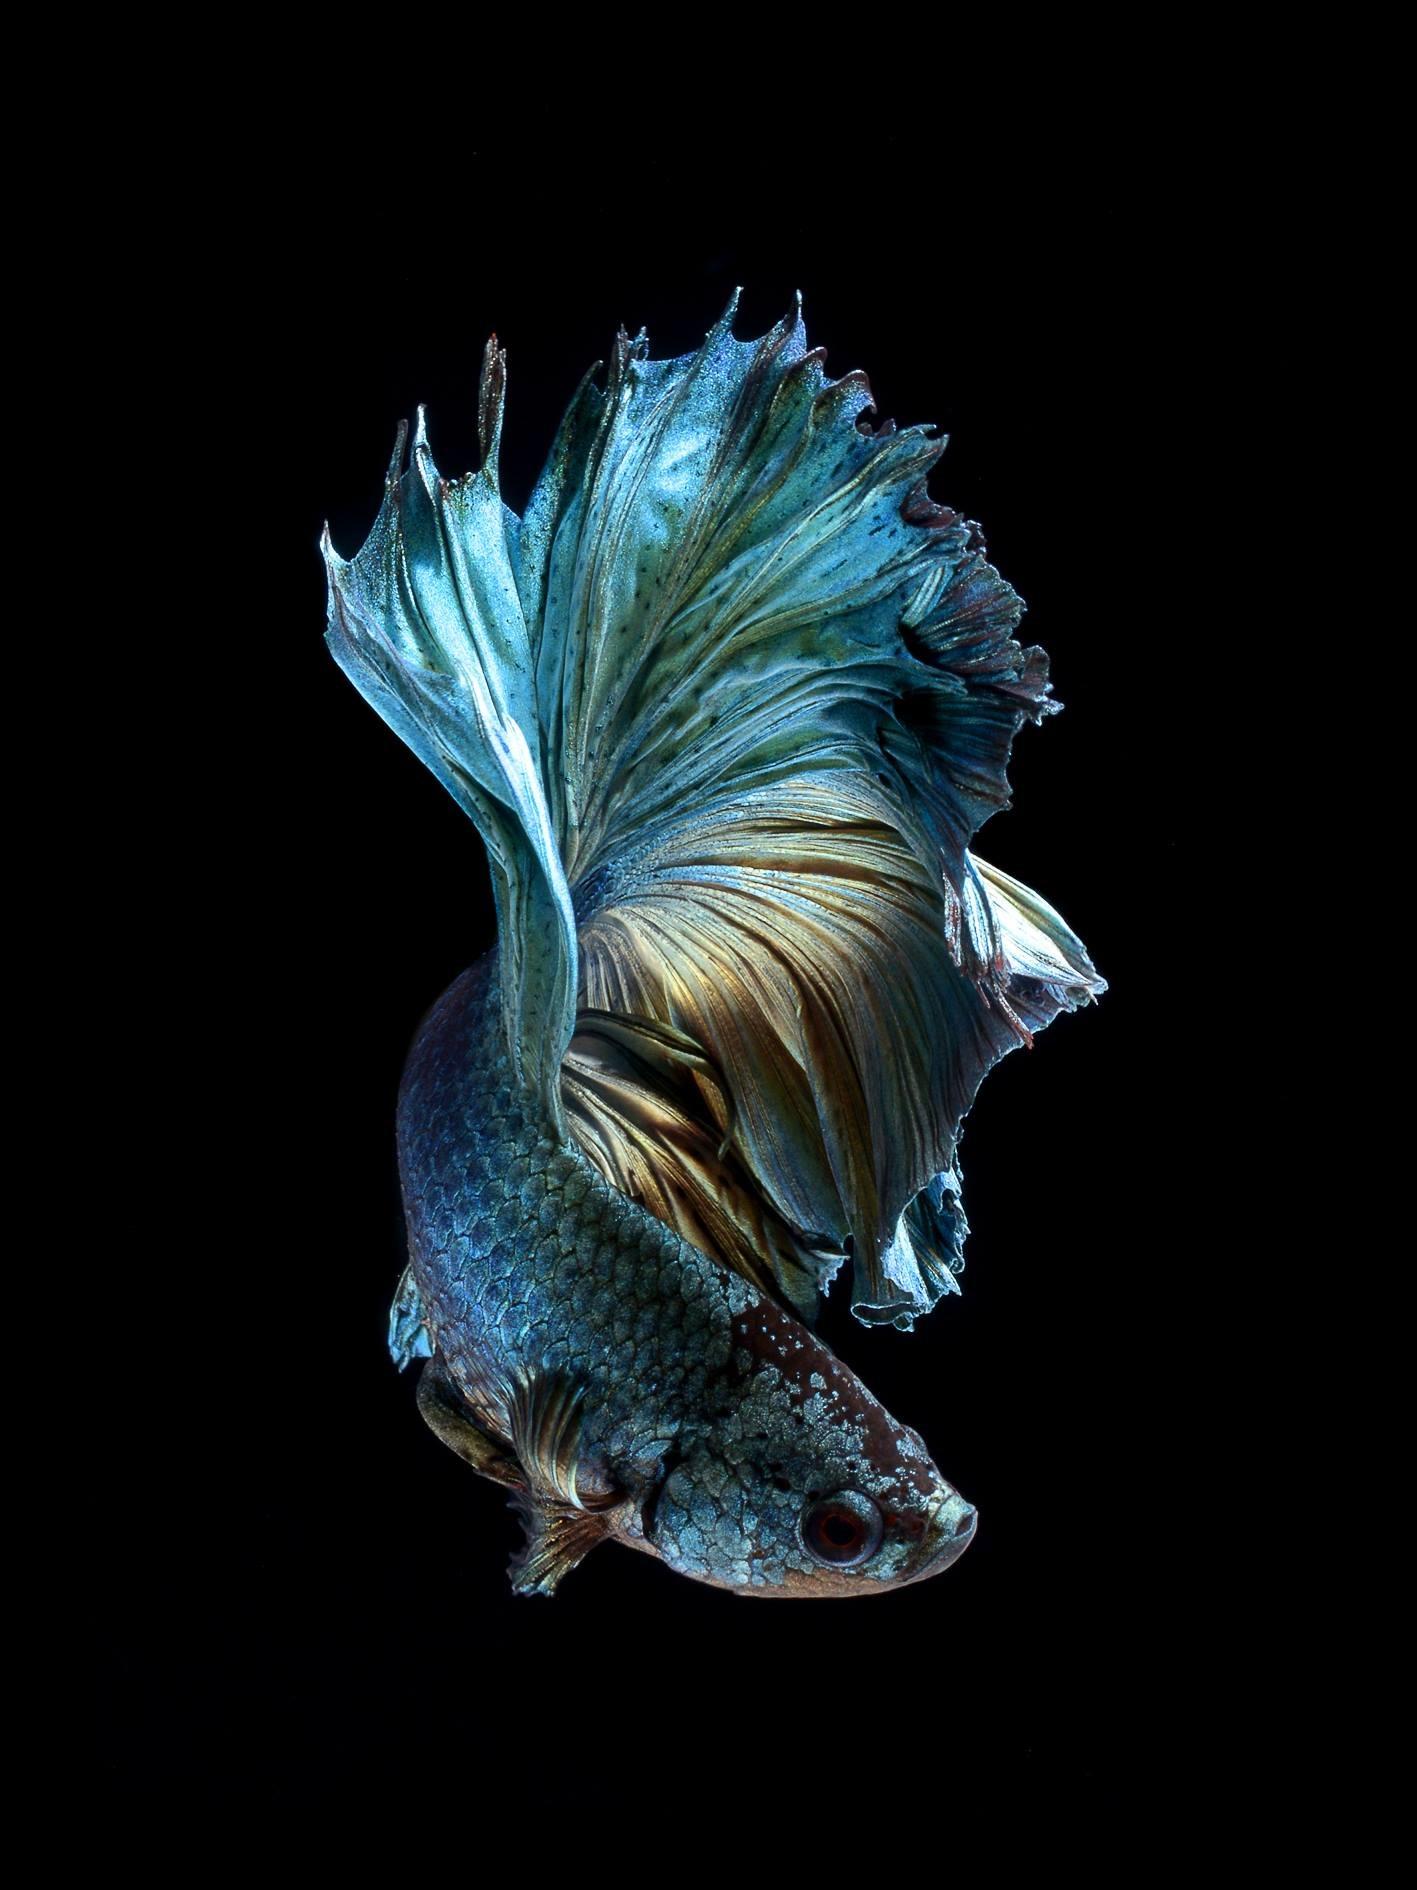 Strange and funky animal photographer visarute for Betta fish live wallpaper